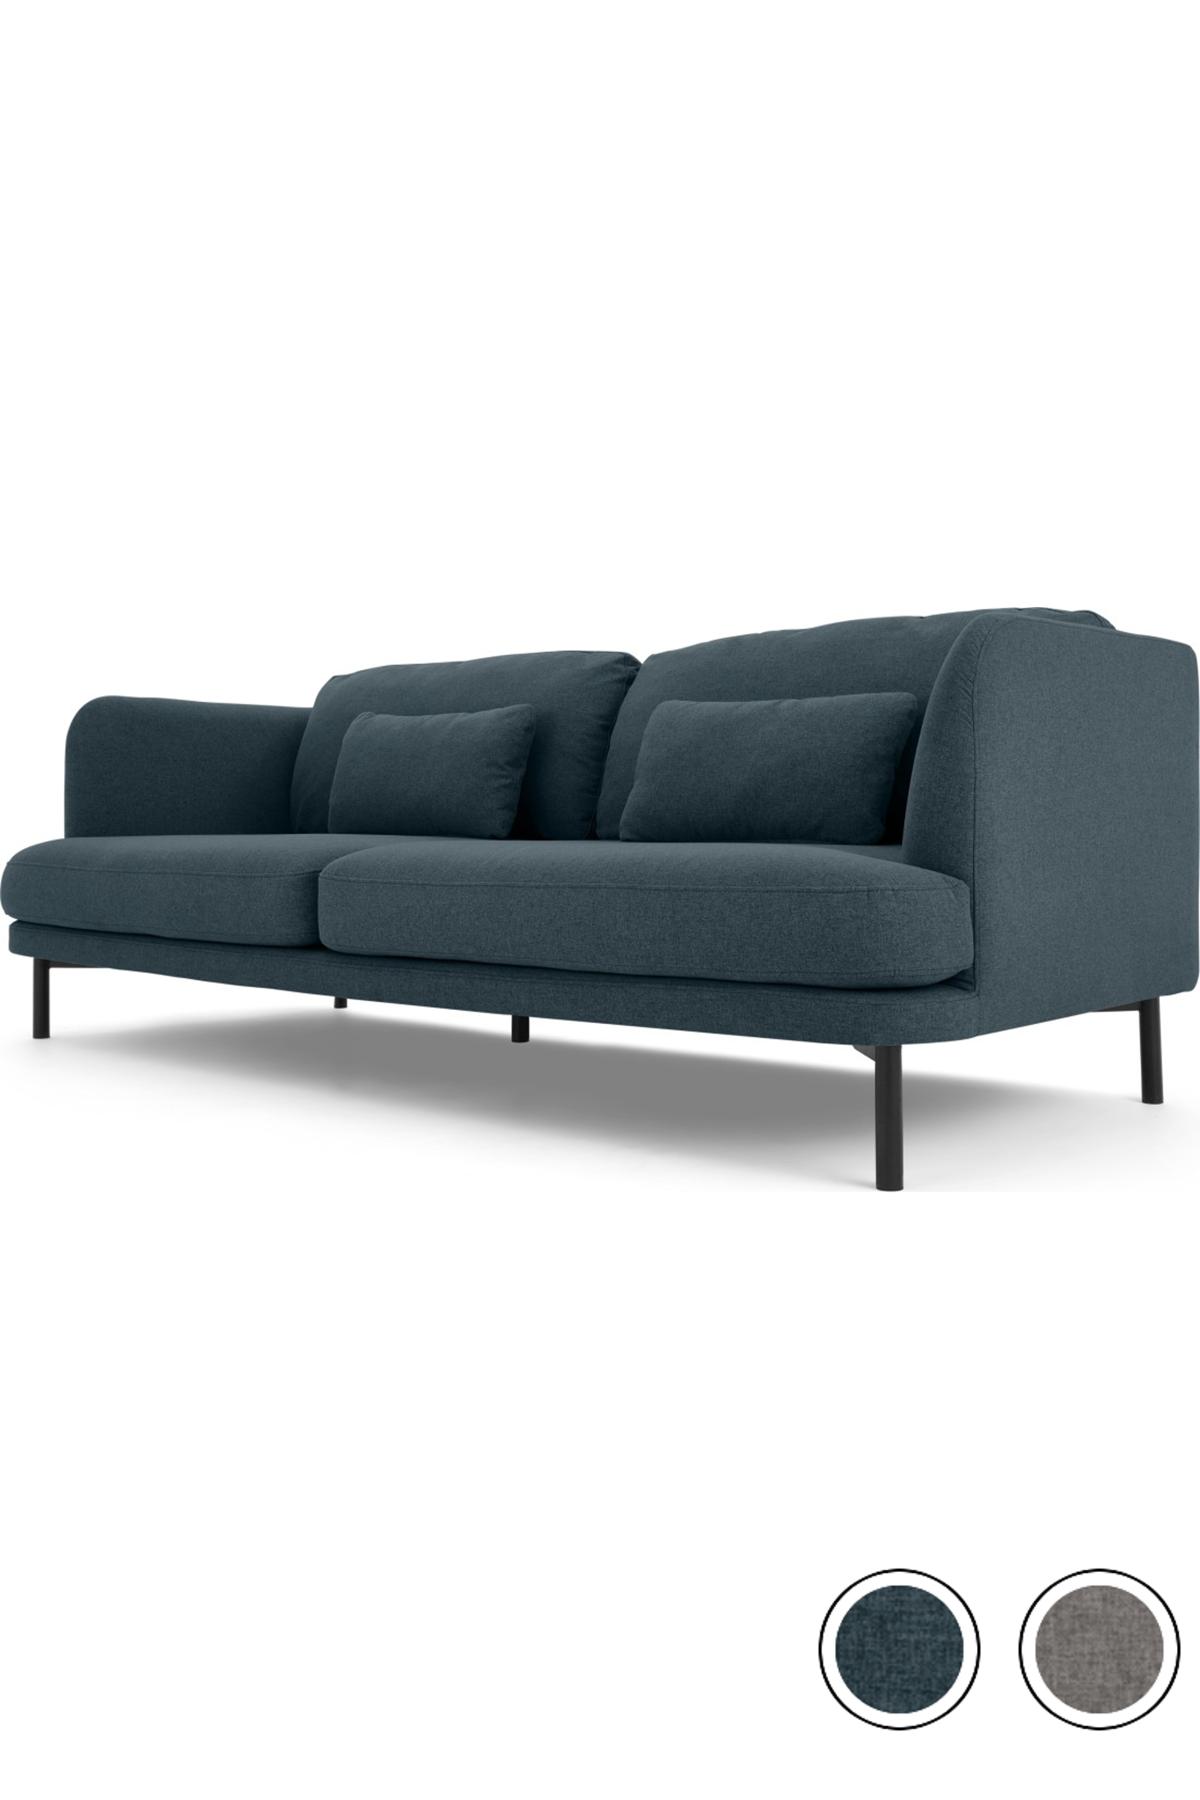 Herman 3 Seater Sofa Aegean Blue 3 Seater Sofa Seater Sofa